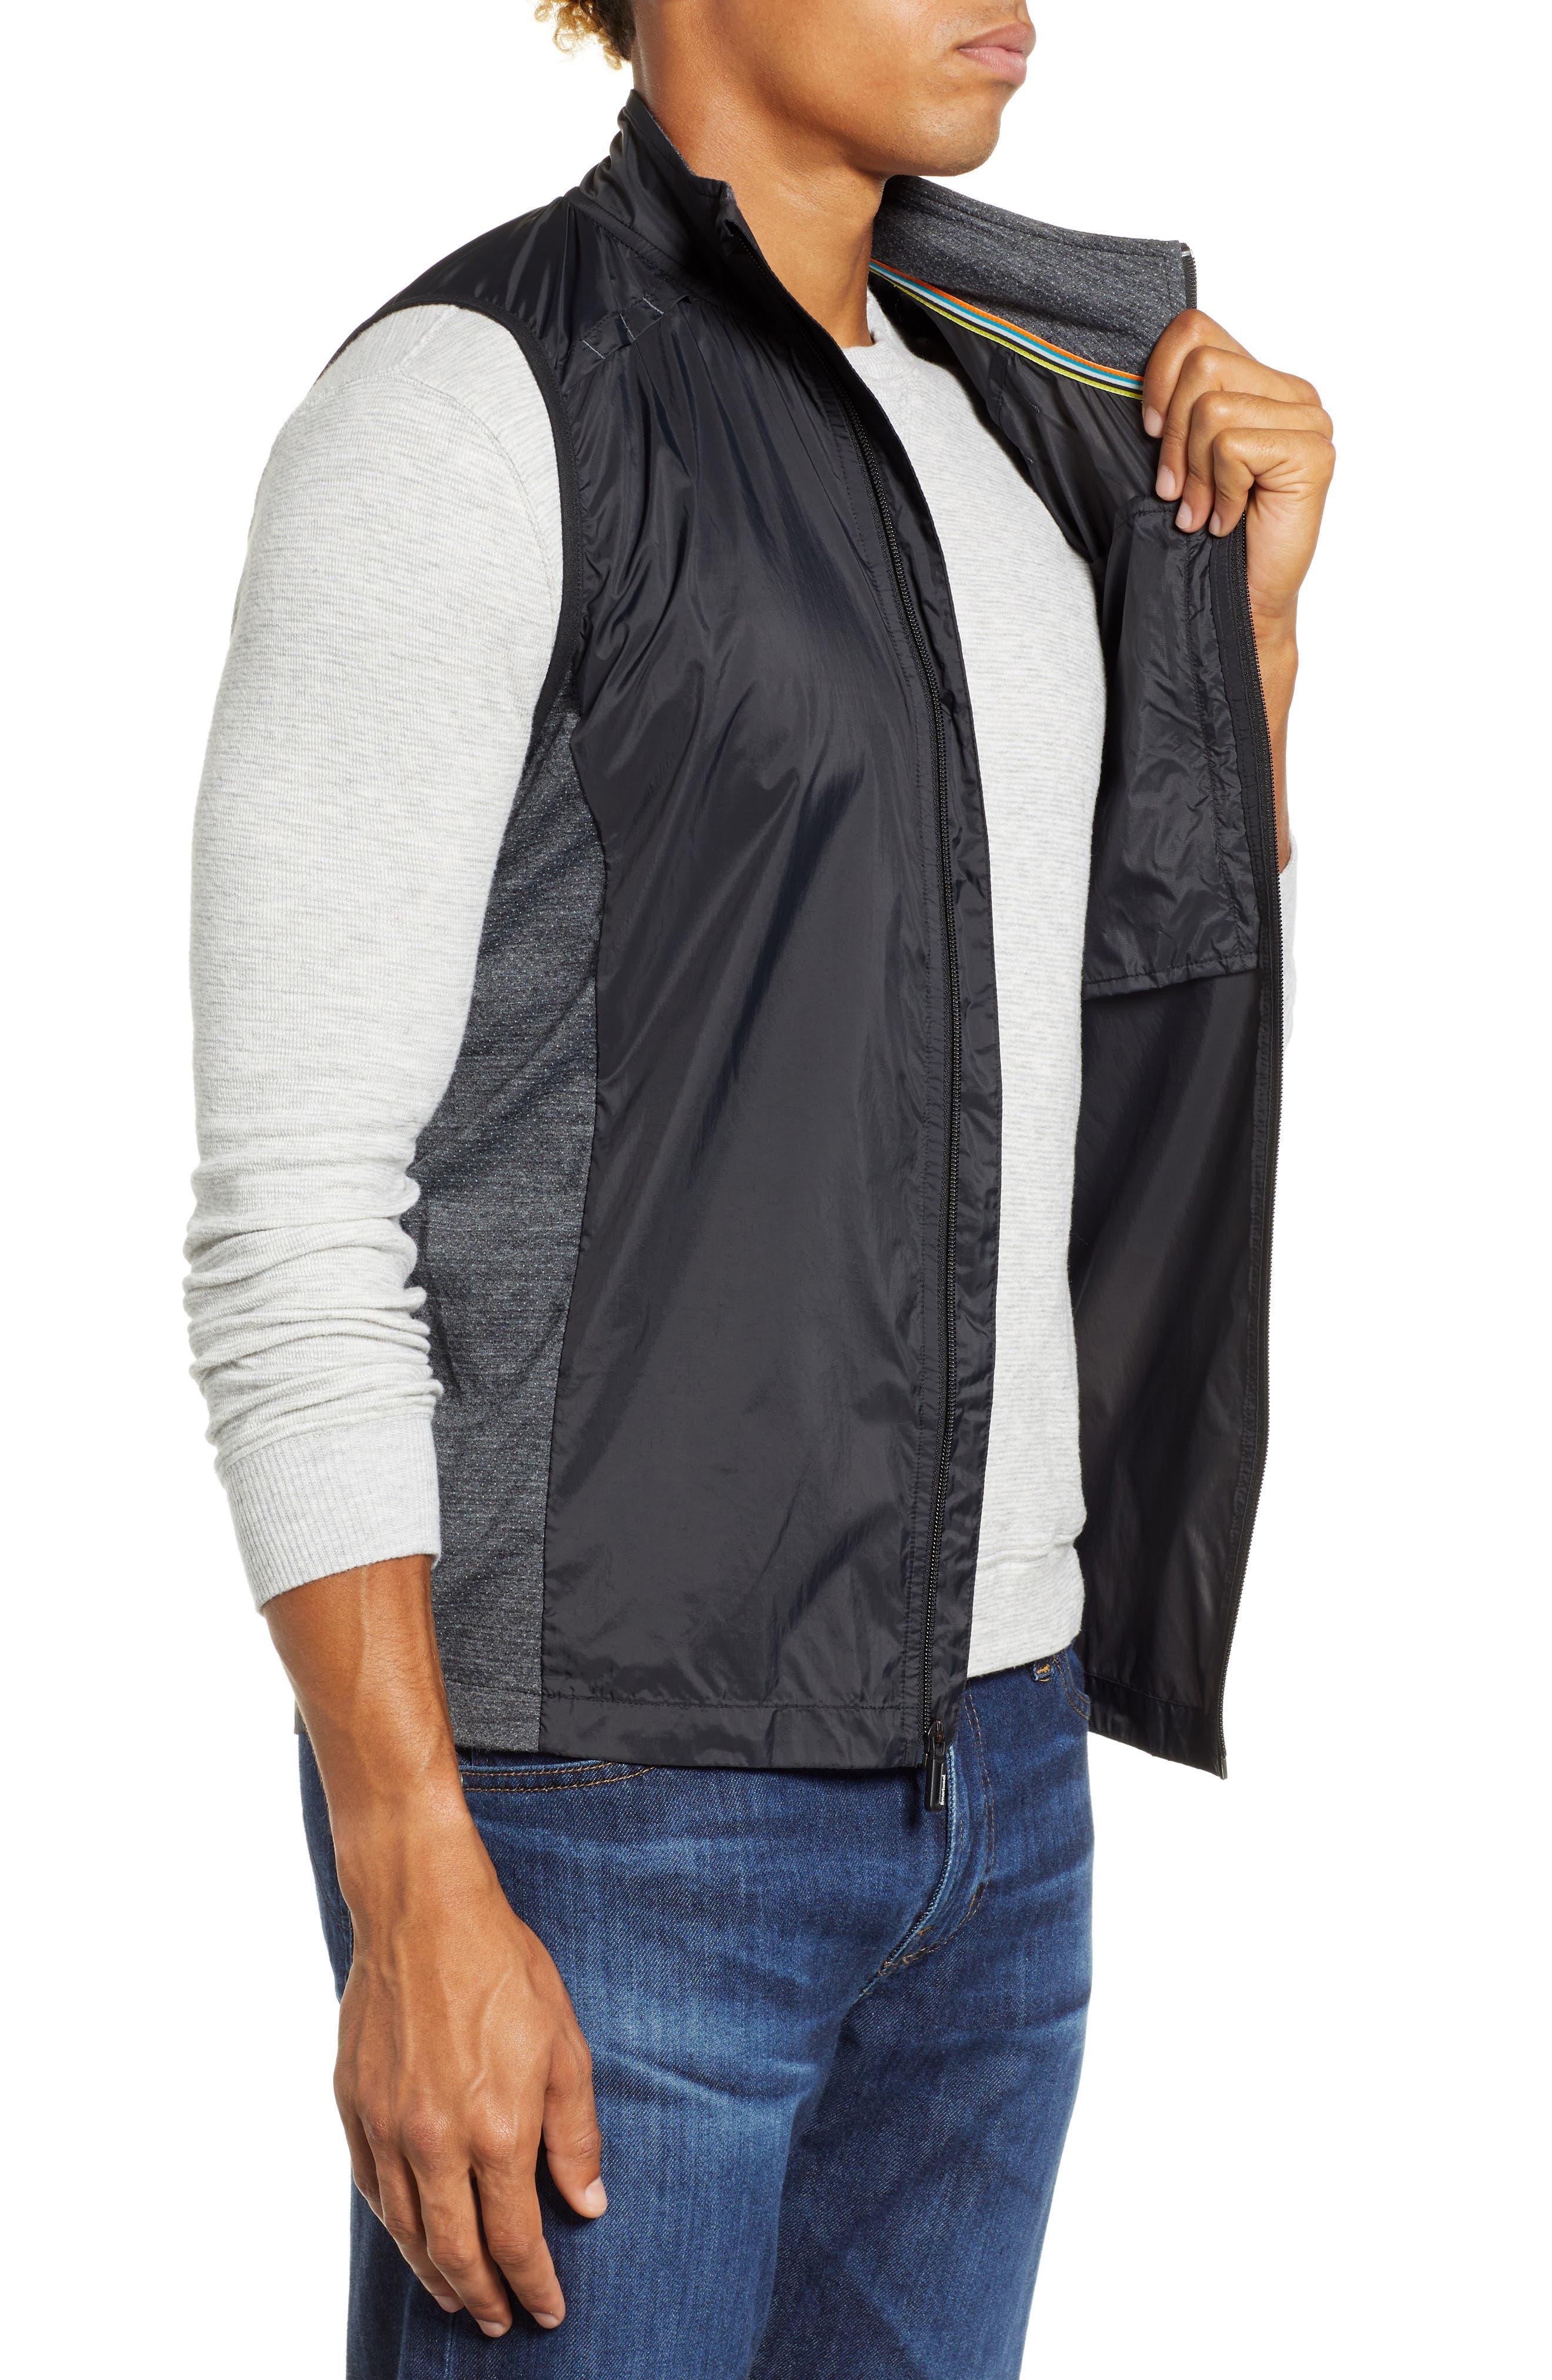 PhD<sup>®</sup> Ultra Light Sport Vest,                             Alternate thumbnail 3, color,                             BLACK